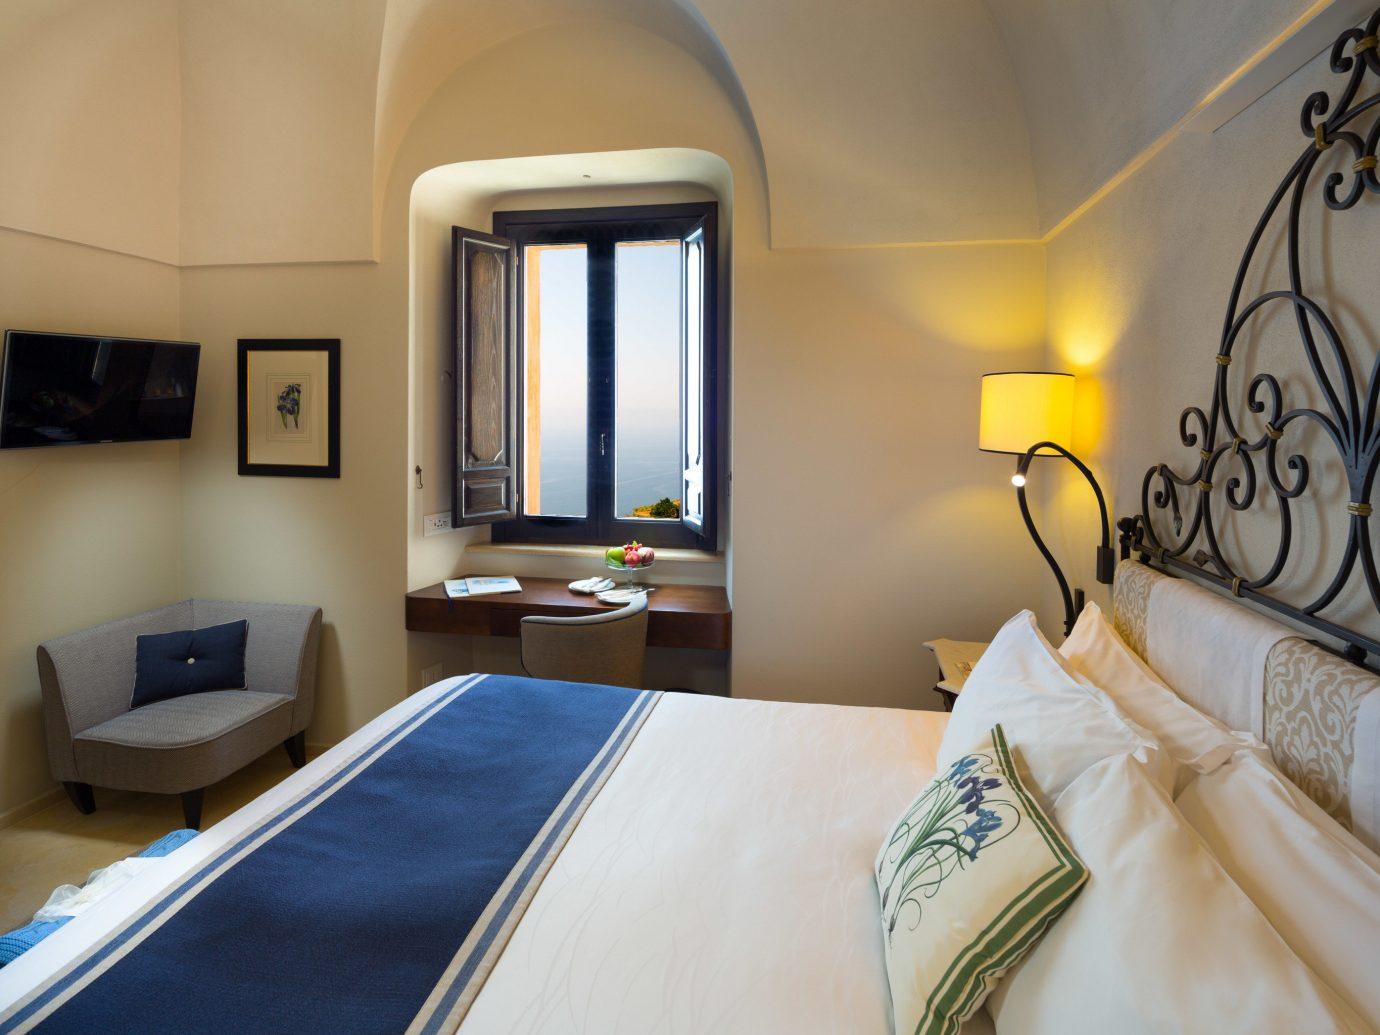 Monastero Santa Rosa Hotel, Amalfi Coast